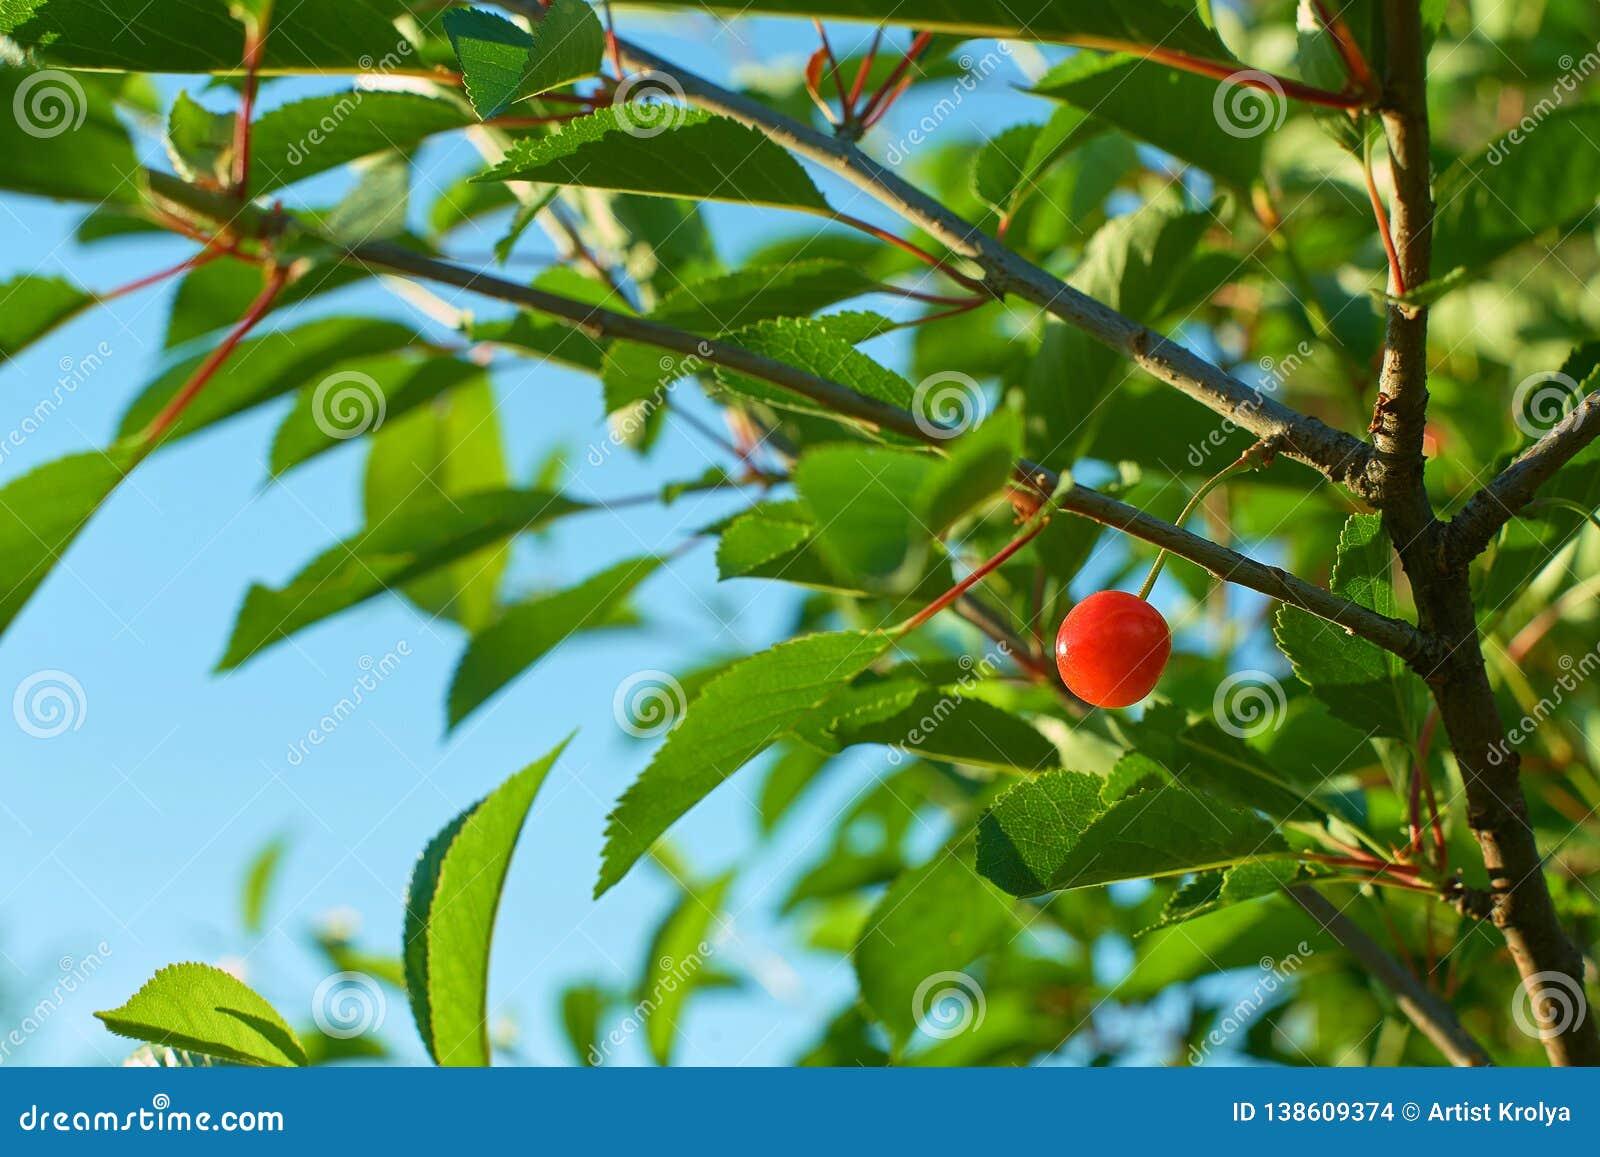 Одиночный зрелый плод вишни вися на ветви